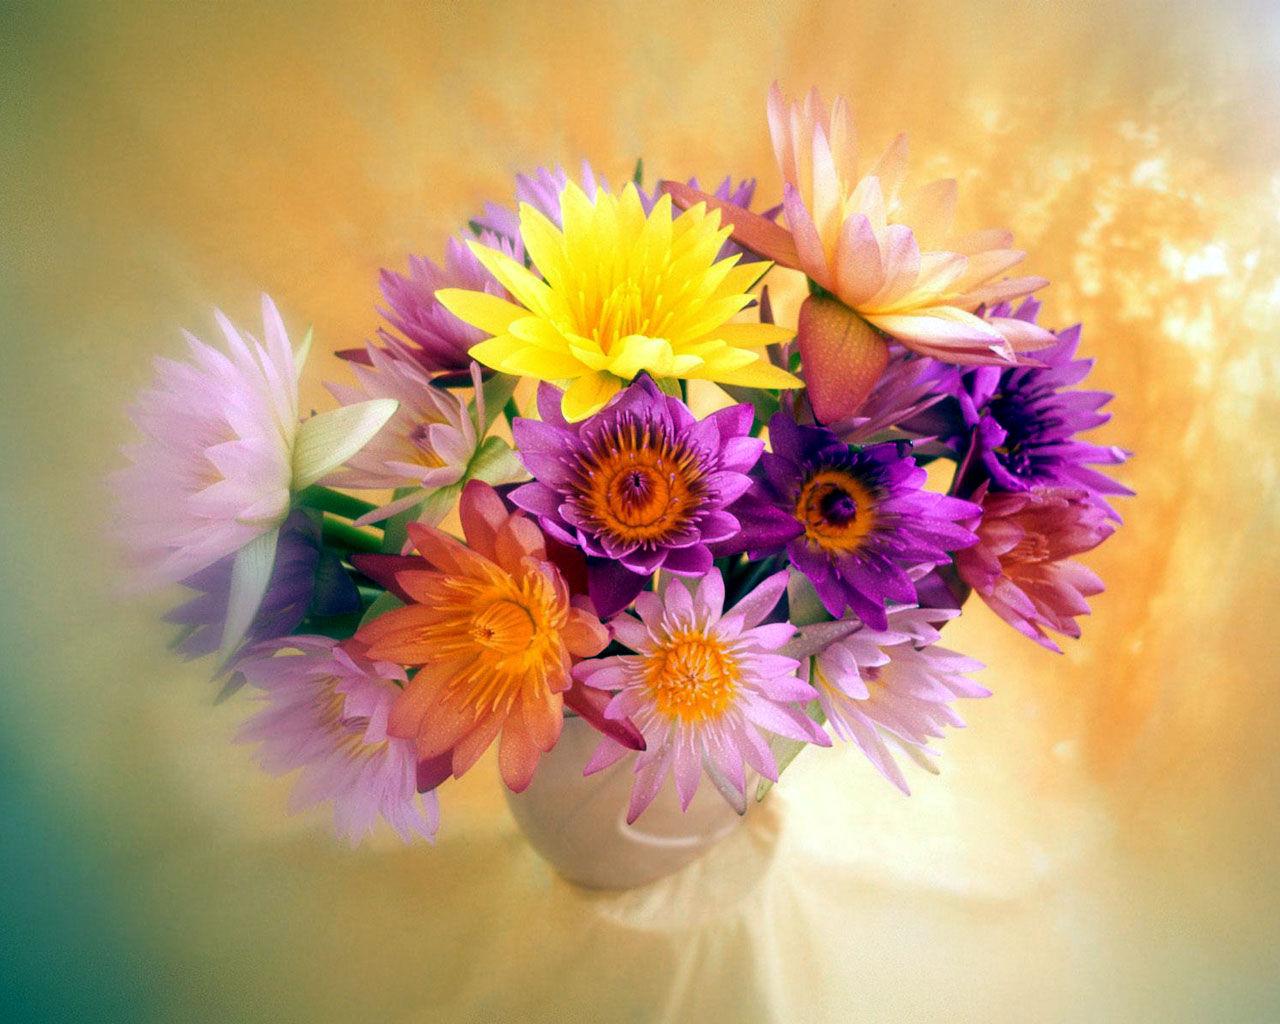 http://www.desktopwallpapers.ru/flowers/pics/bunch_of_flowers-1280.jpg